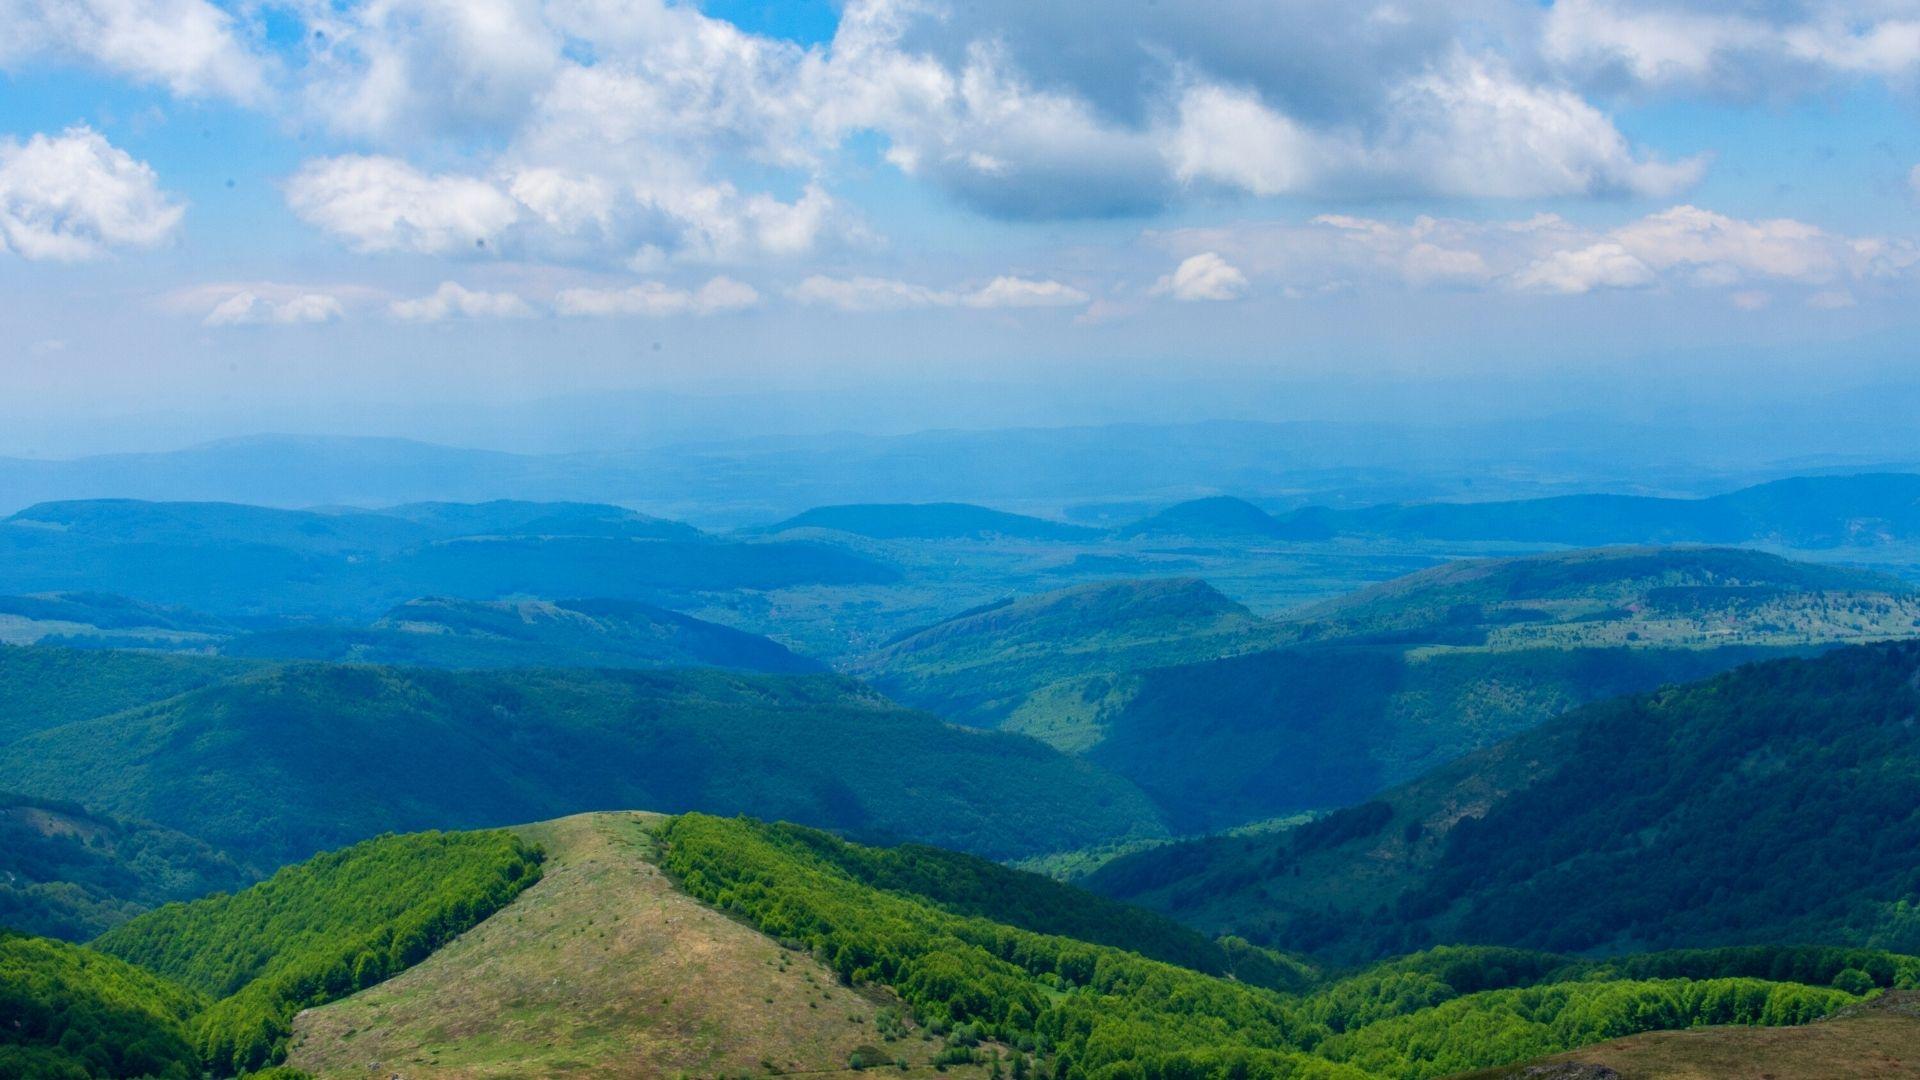 Връх Ком, Стара планина, планниски преход за начинаещи2